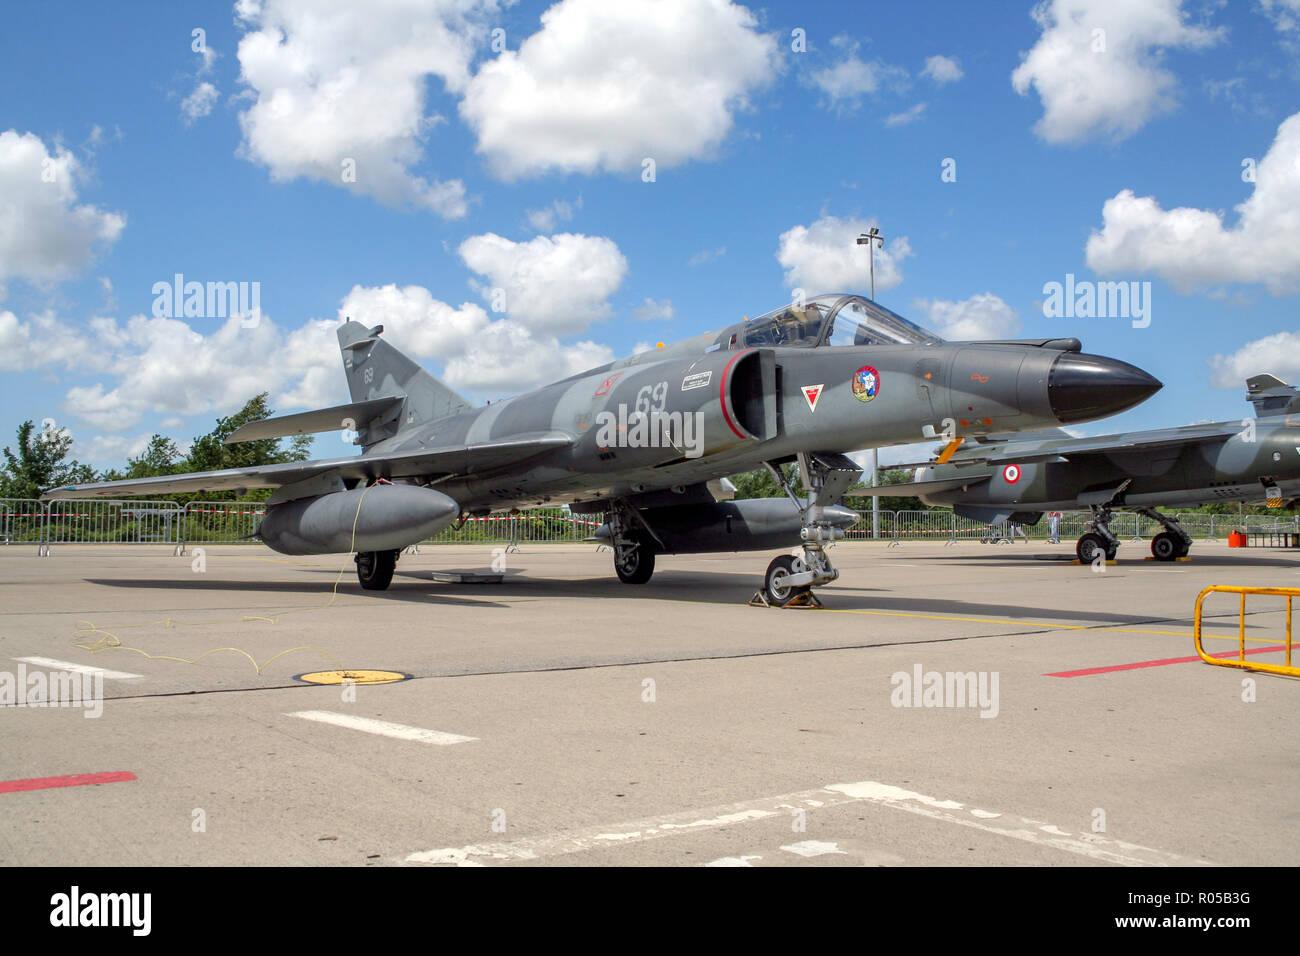 FLORENNES, BELGIUM - JUL 6, 2008: French Navy Dassault Super Etendard fighter jet on the tarmac of Florennes airbase Stock Photo